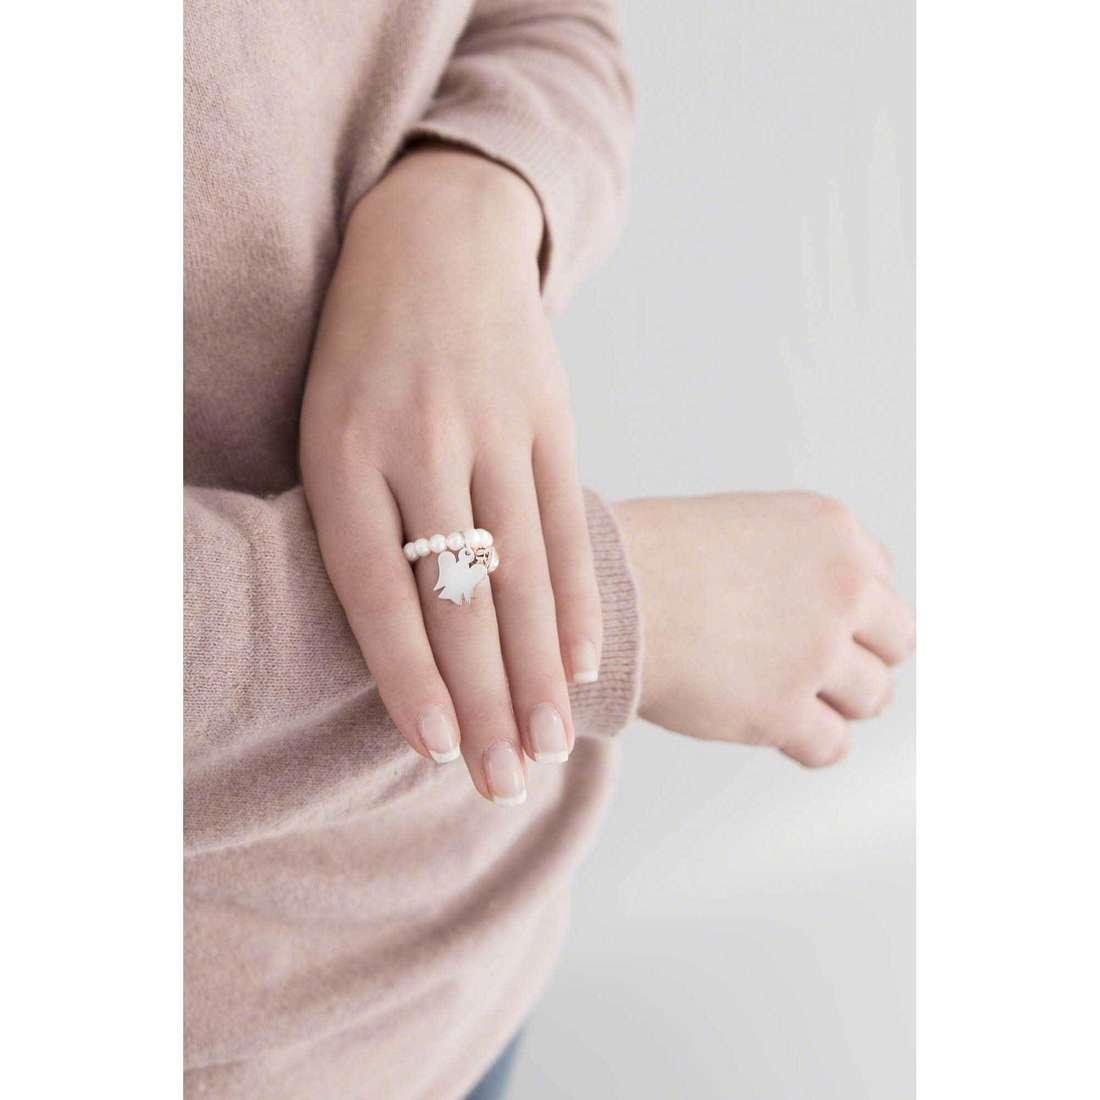 Giannotti anelli Chiama Angeli donna GIA252-13-15 indosso